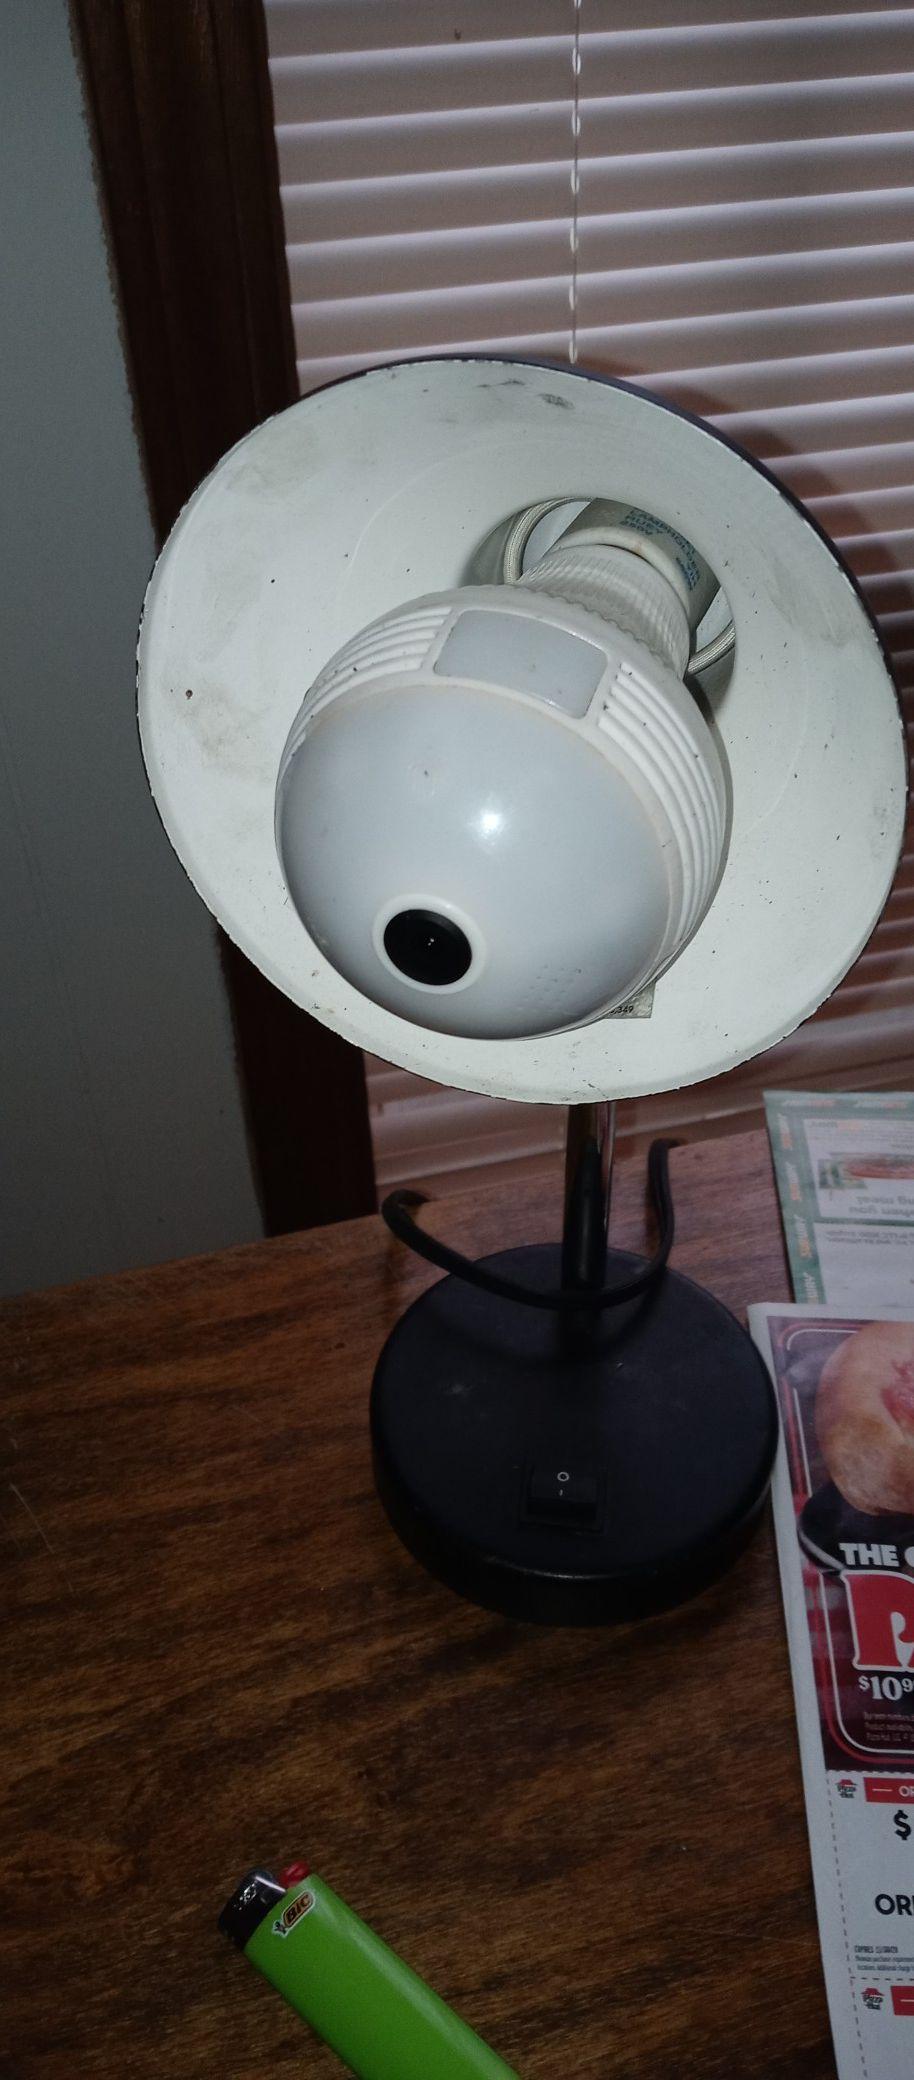 ICanSee Lightbulb fisheye security camera